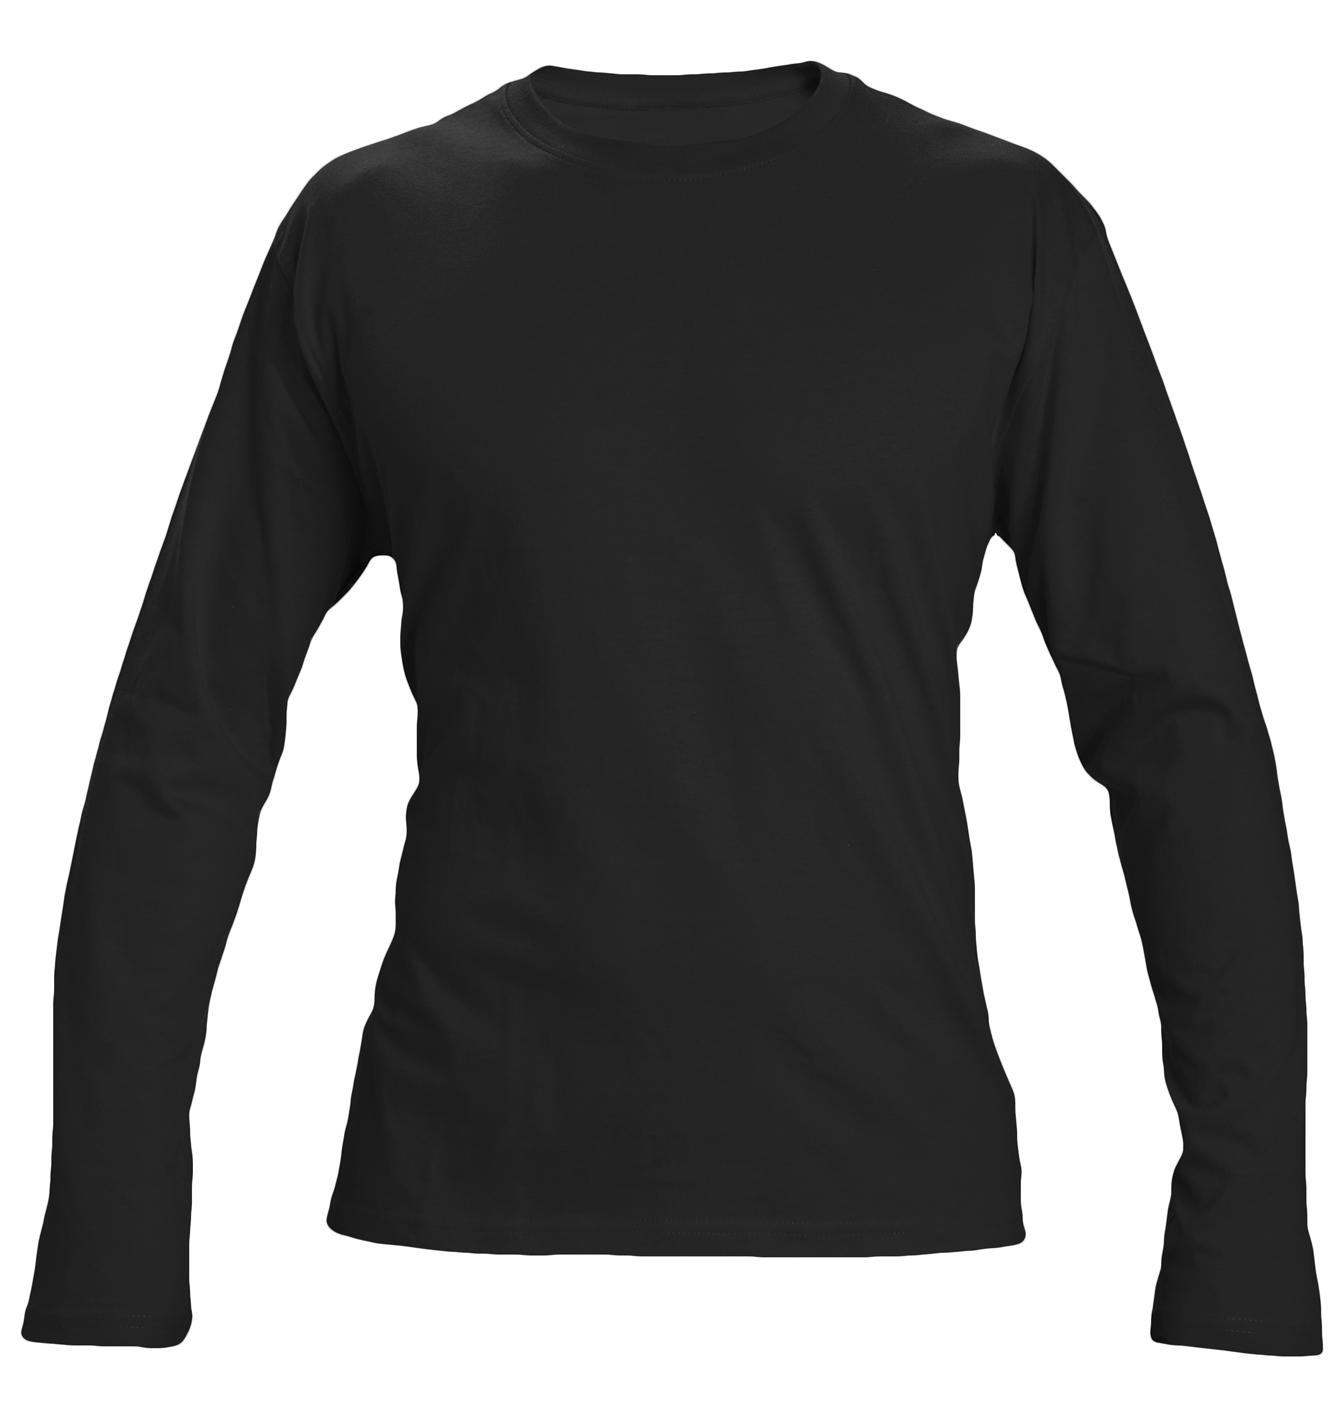 Image of   T-shirt Cambon langt ærme